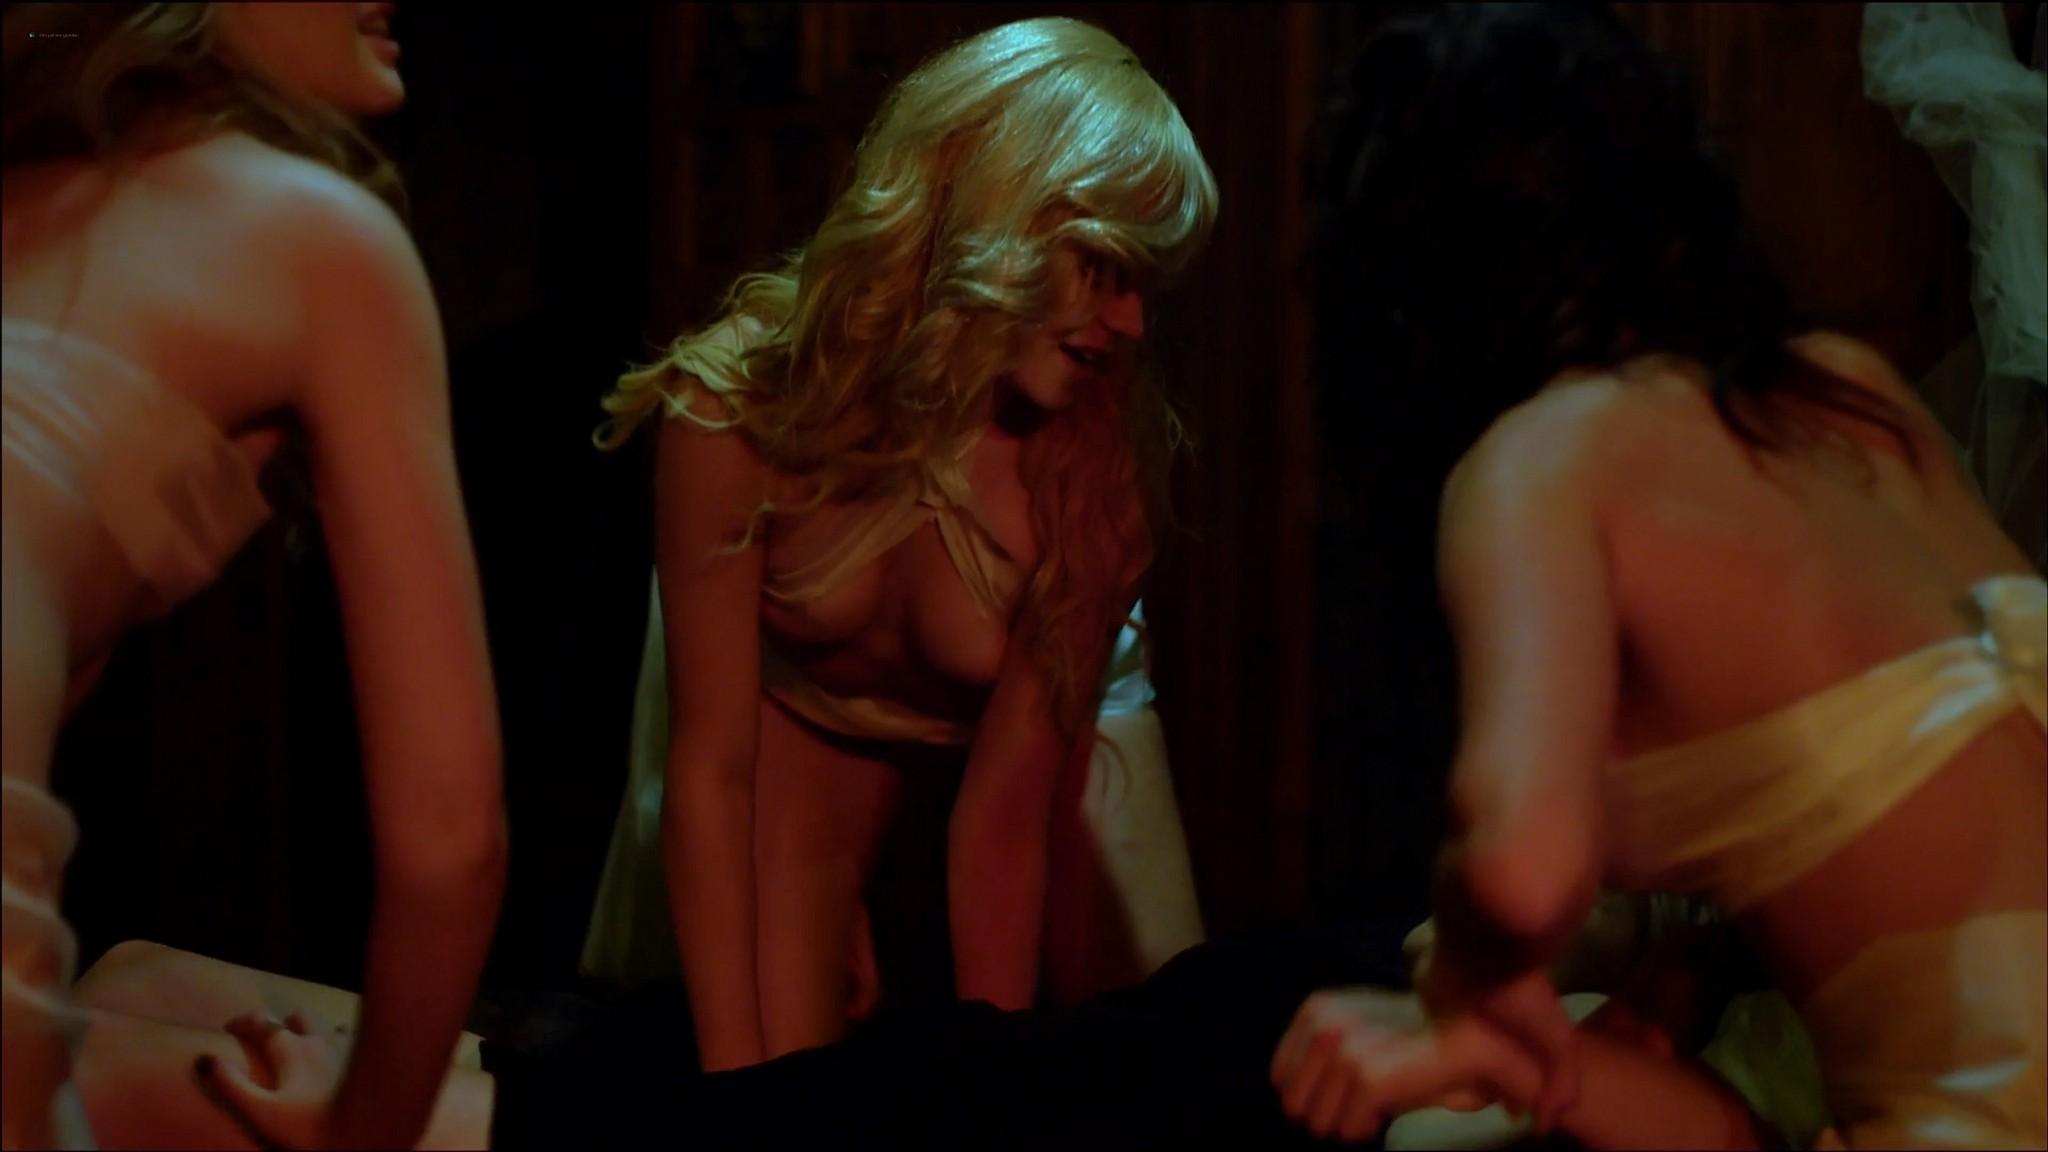 Mindy Robinson see through Christina Collard nude Dracula The Impaler 2013 1080p BluRay 13